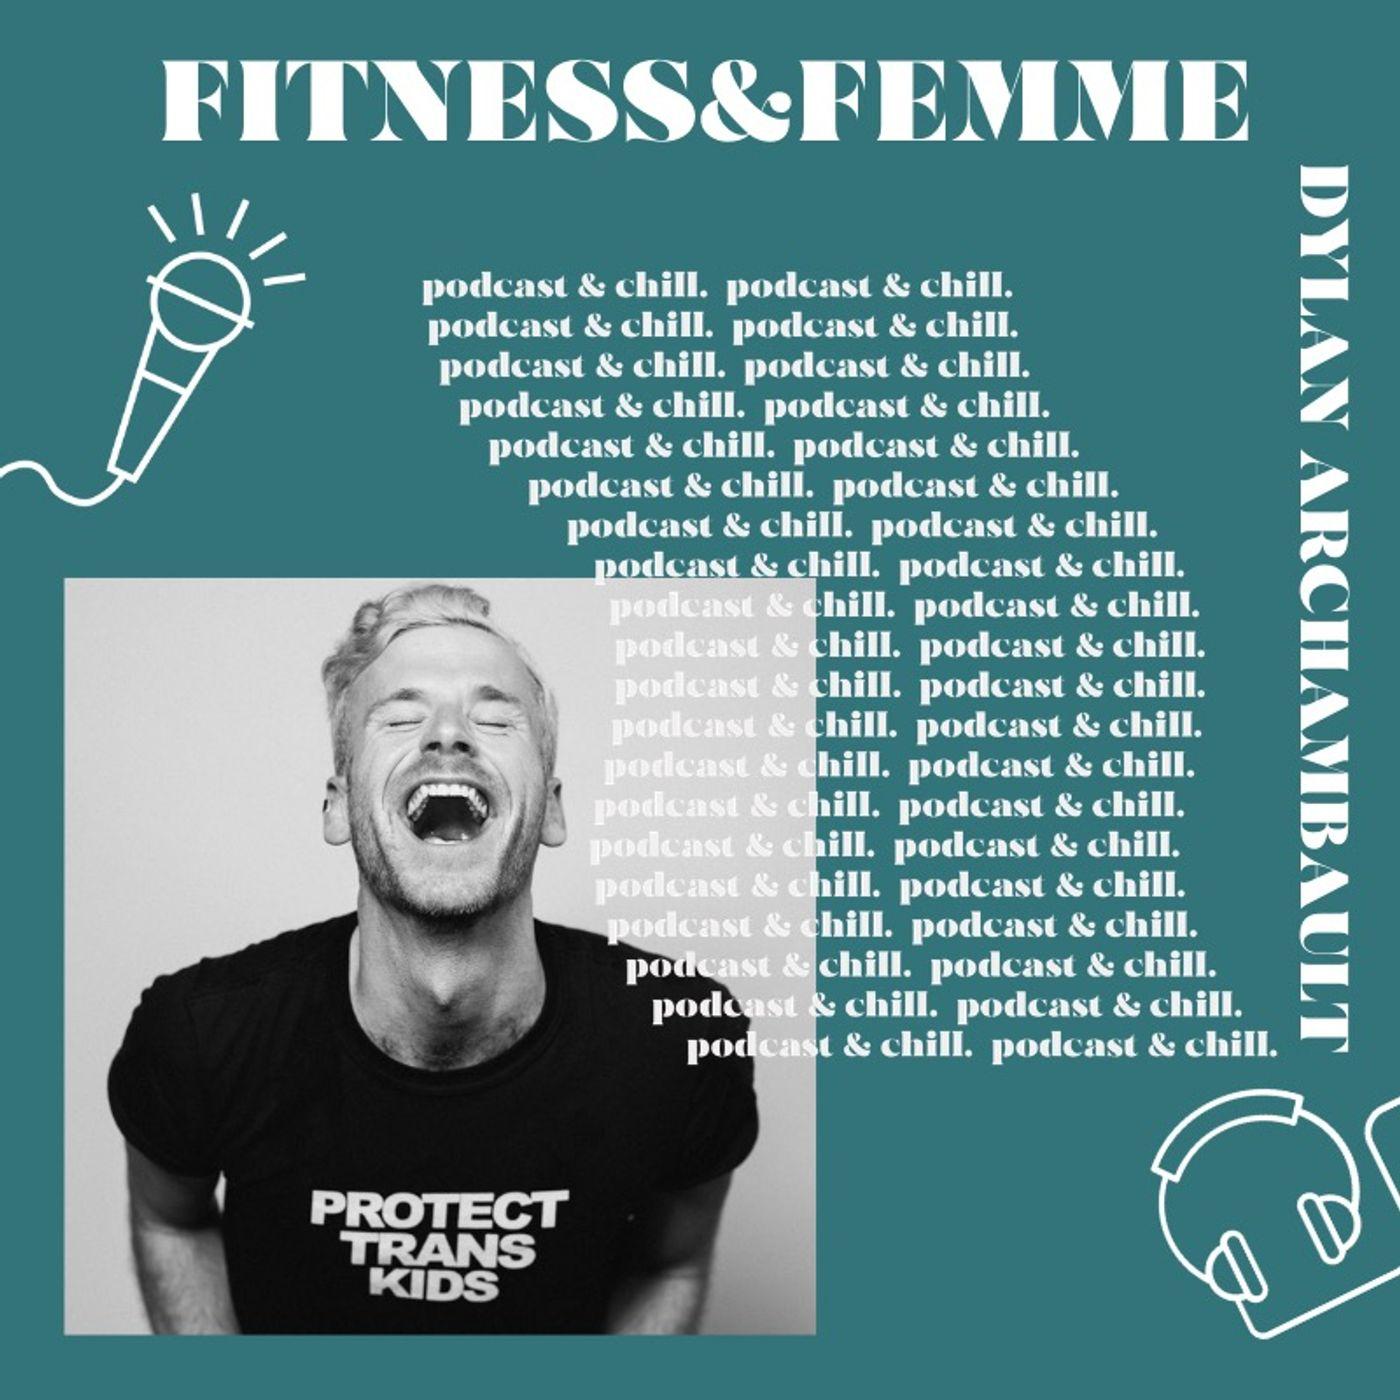 Dylan Archambault - fitness & femme